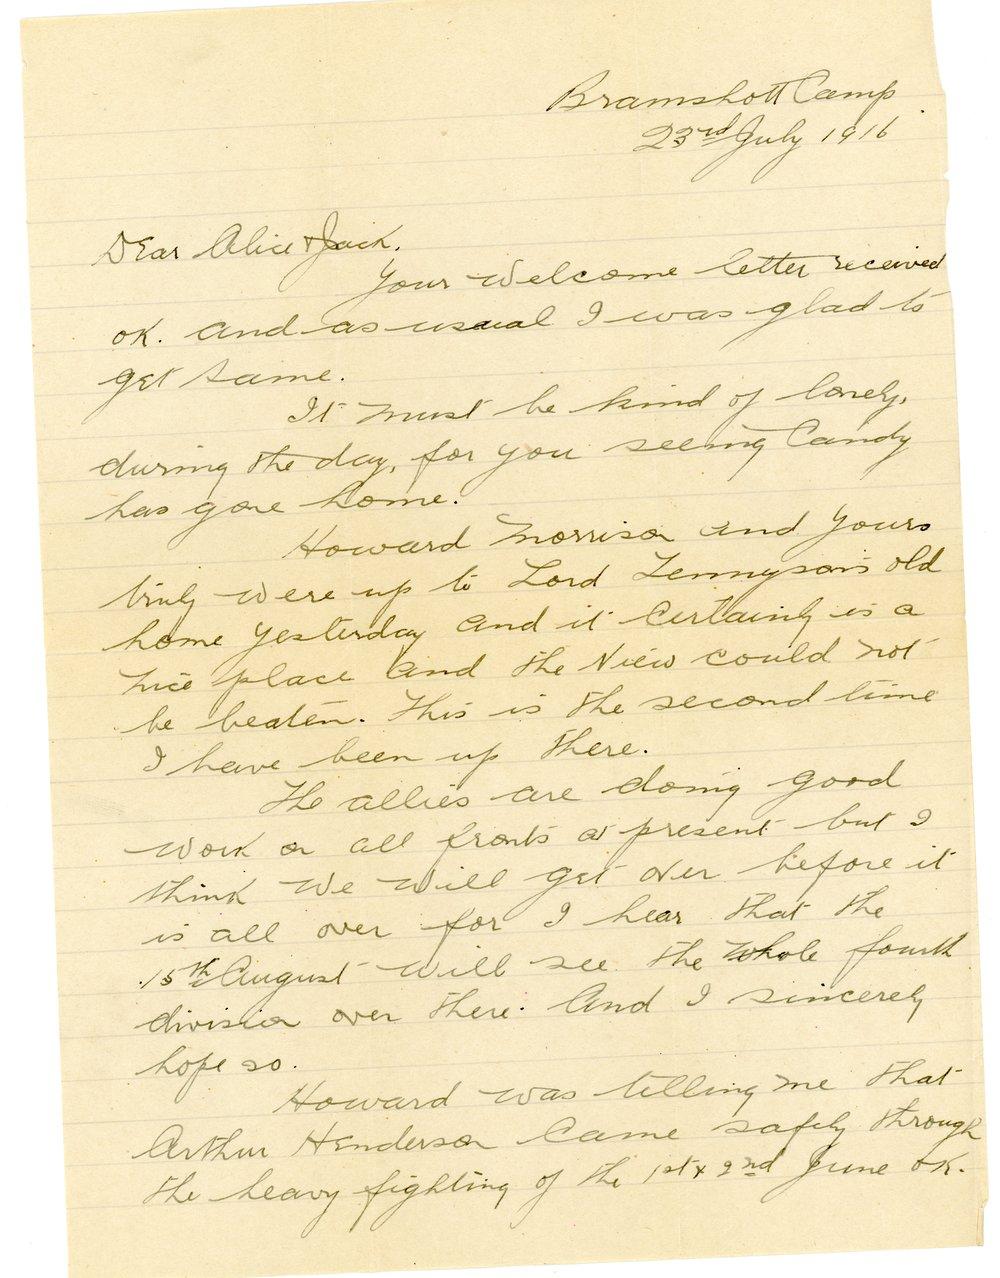 23,July,1916001.jpg